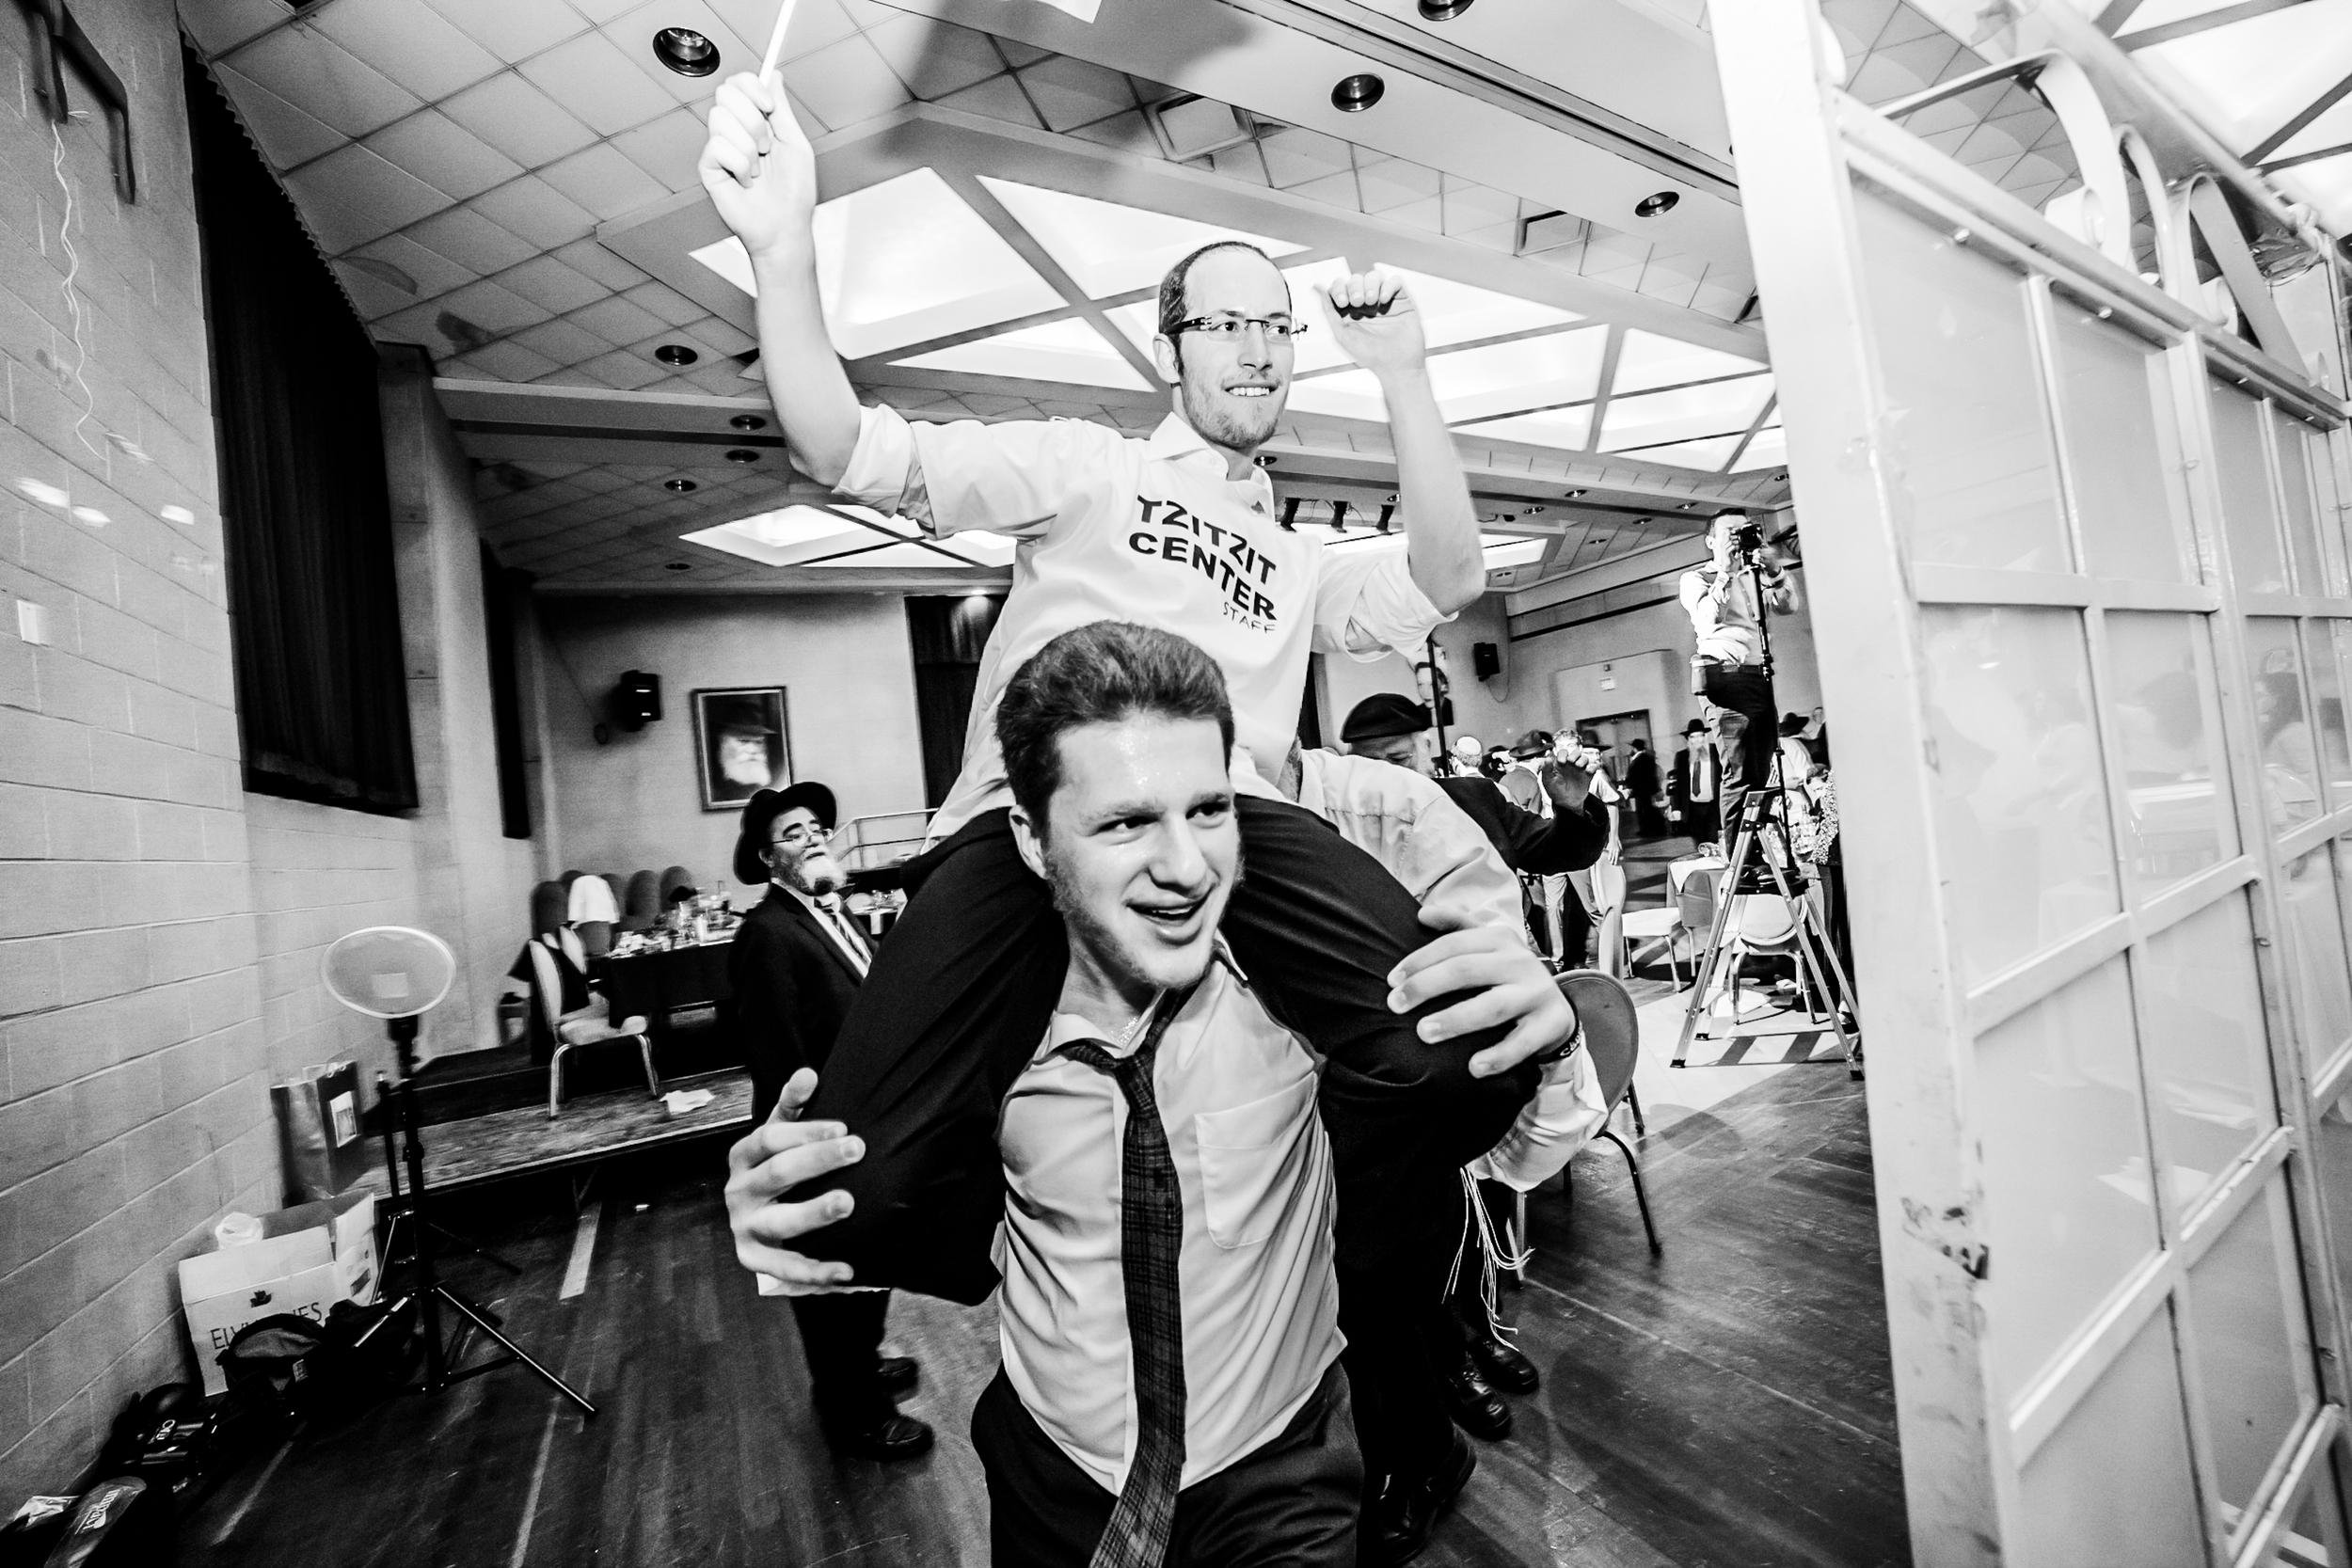 Wedding Iossi and Gitty Khafif  - Eliau Piha studio photography, new york, events, people 770 brooklyn -0893.jpg